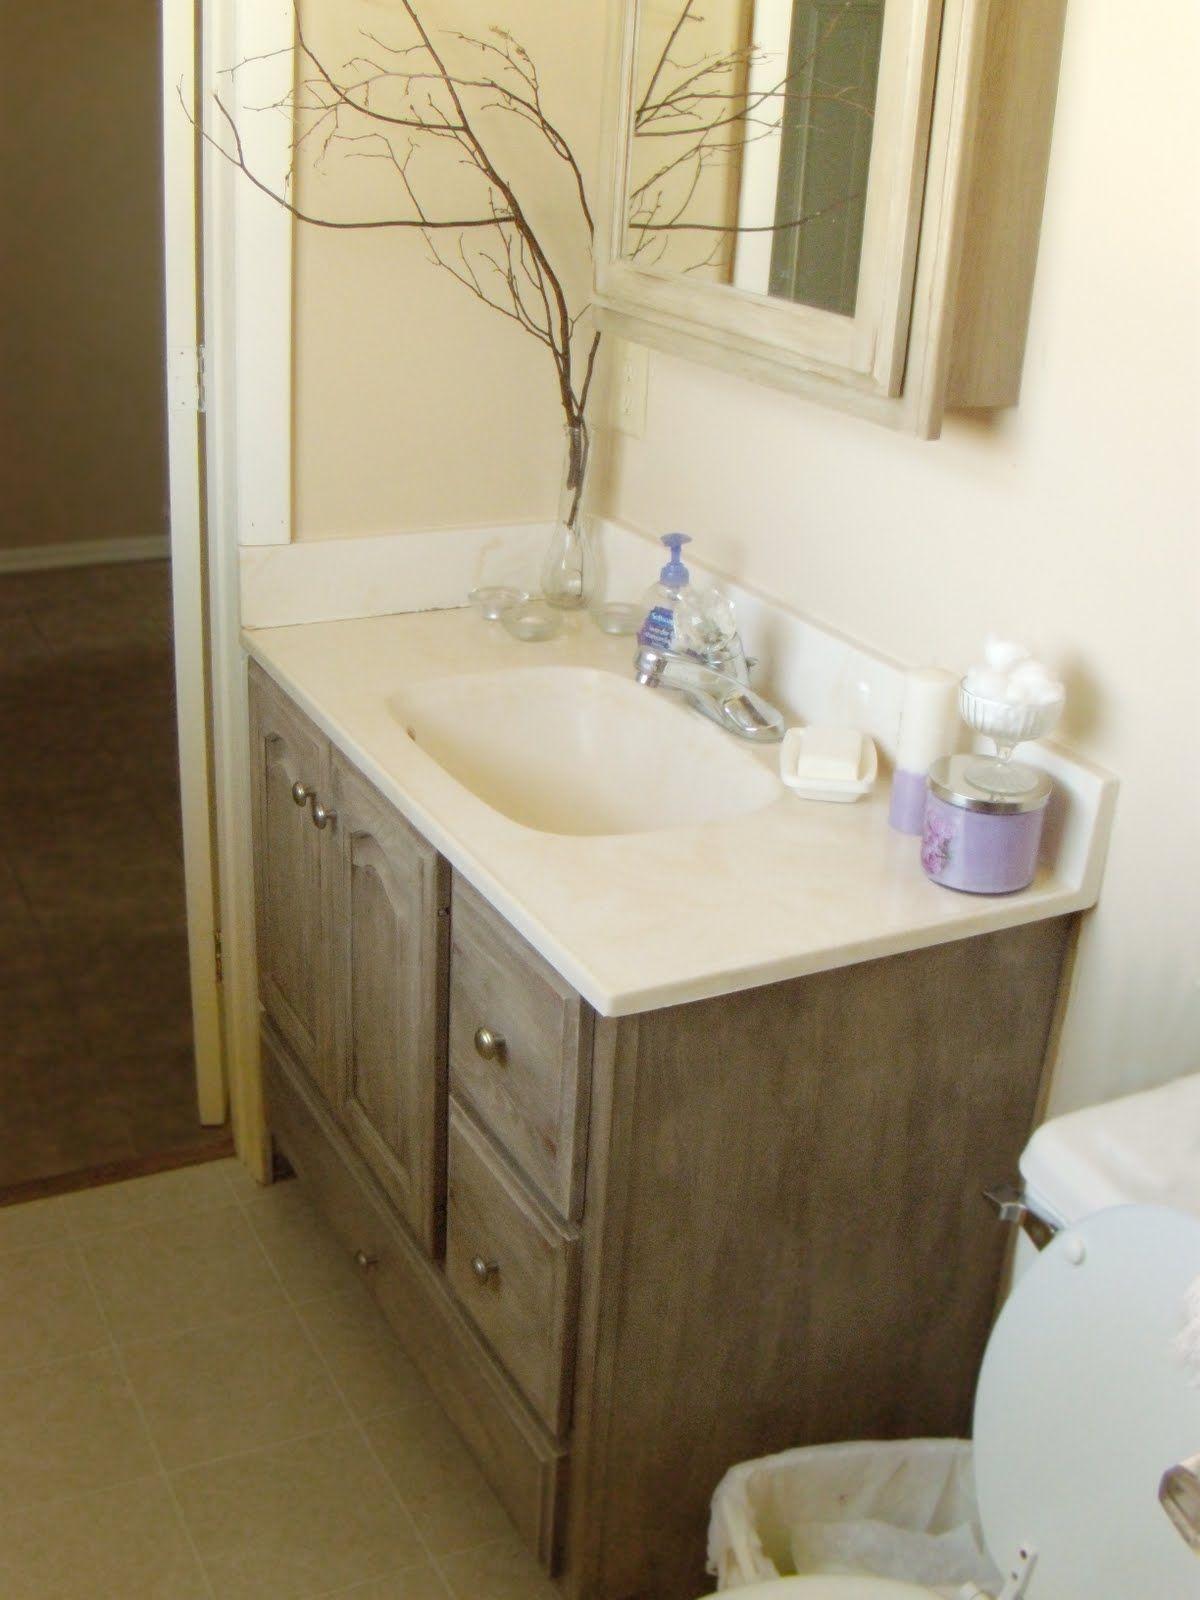 bathroom vanity redo ideas | pinterdor | Pinterest | Ideas, Bathroom ...